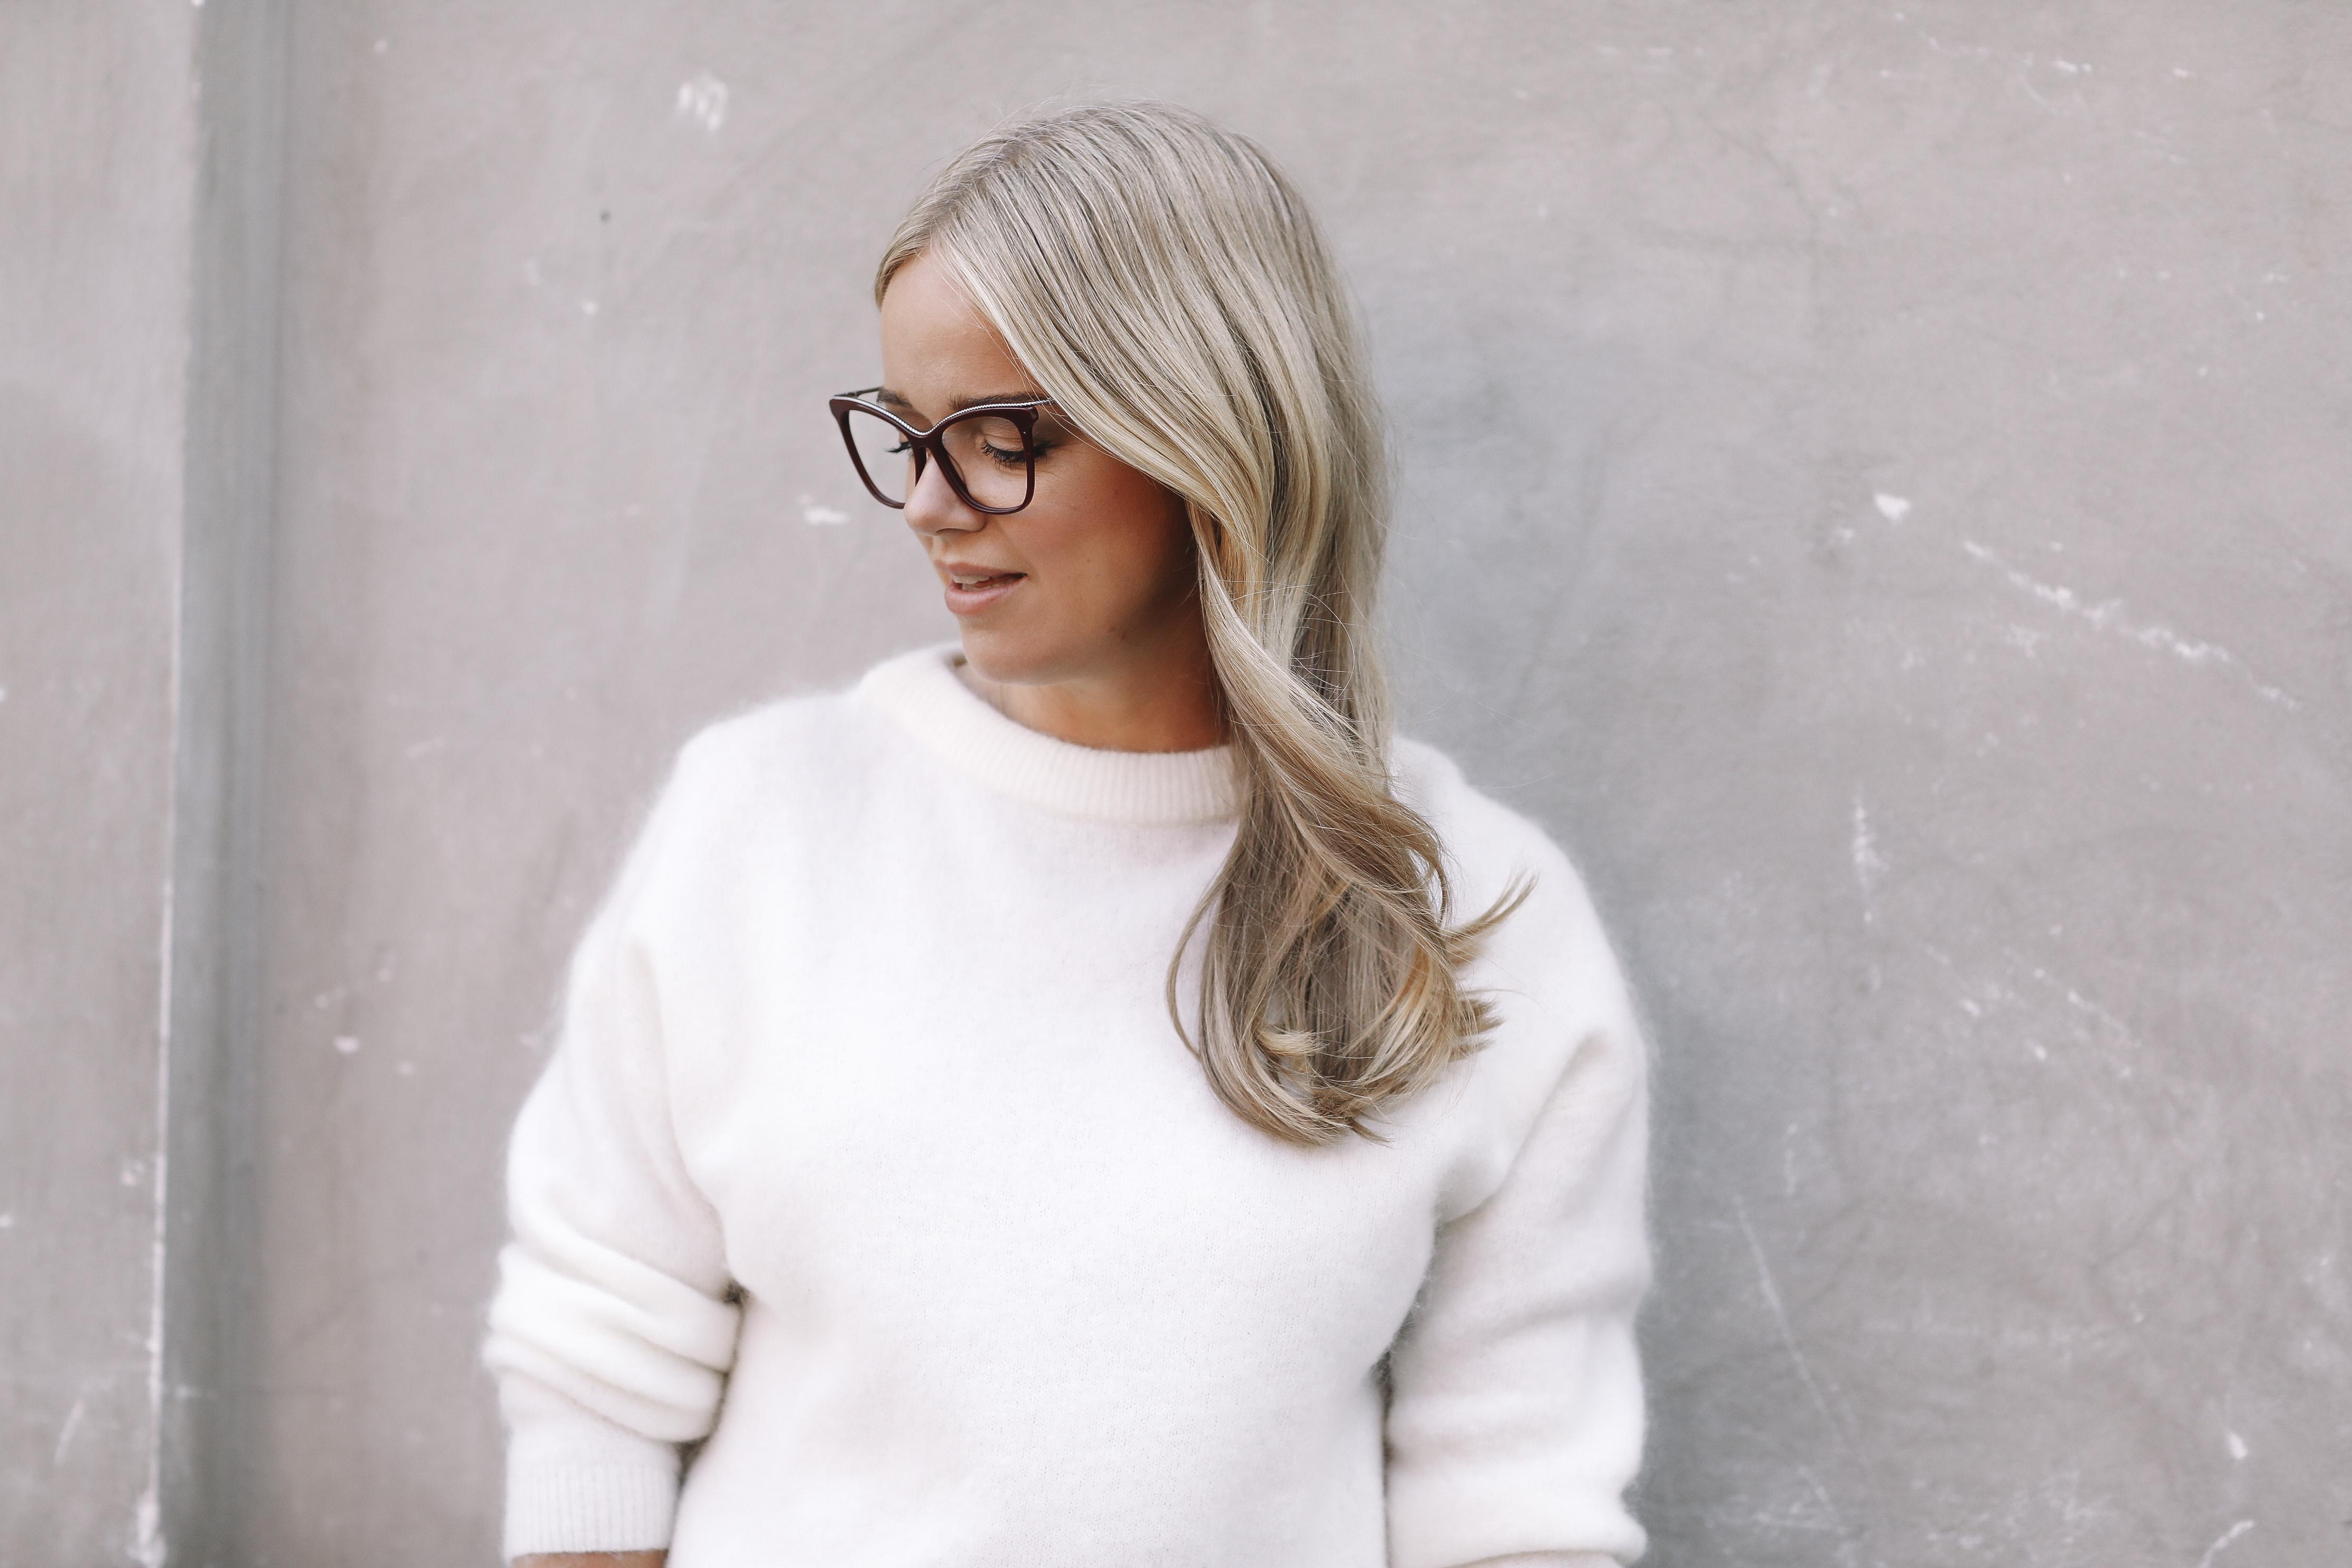 Uppdatera din look – vinn nya glasögon! – Ebba Kleberg von Sydow 27453eb132e9c